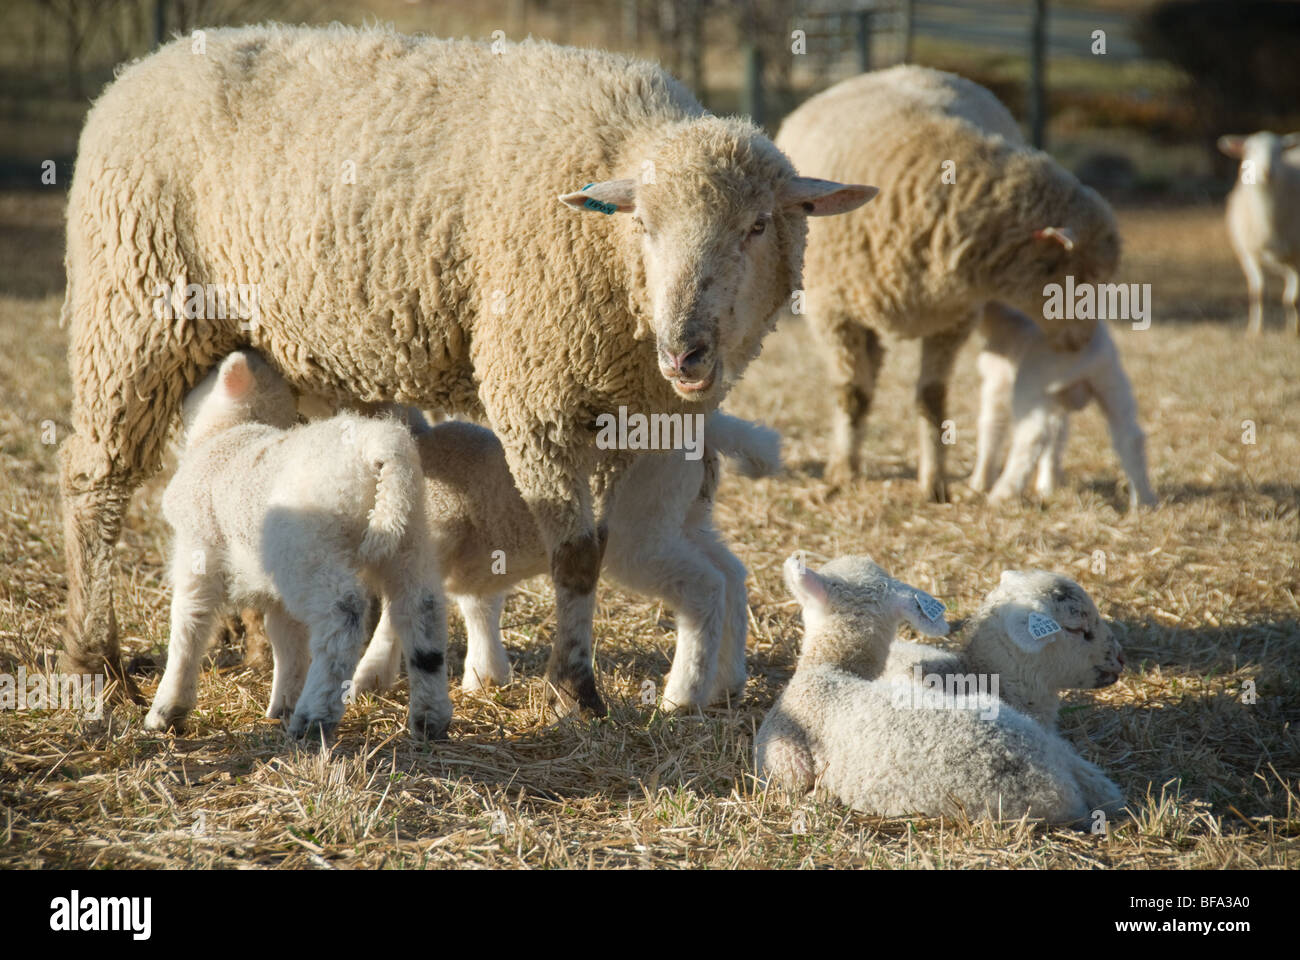 Katahdin sheep and lambs on farm - Stock Image